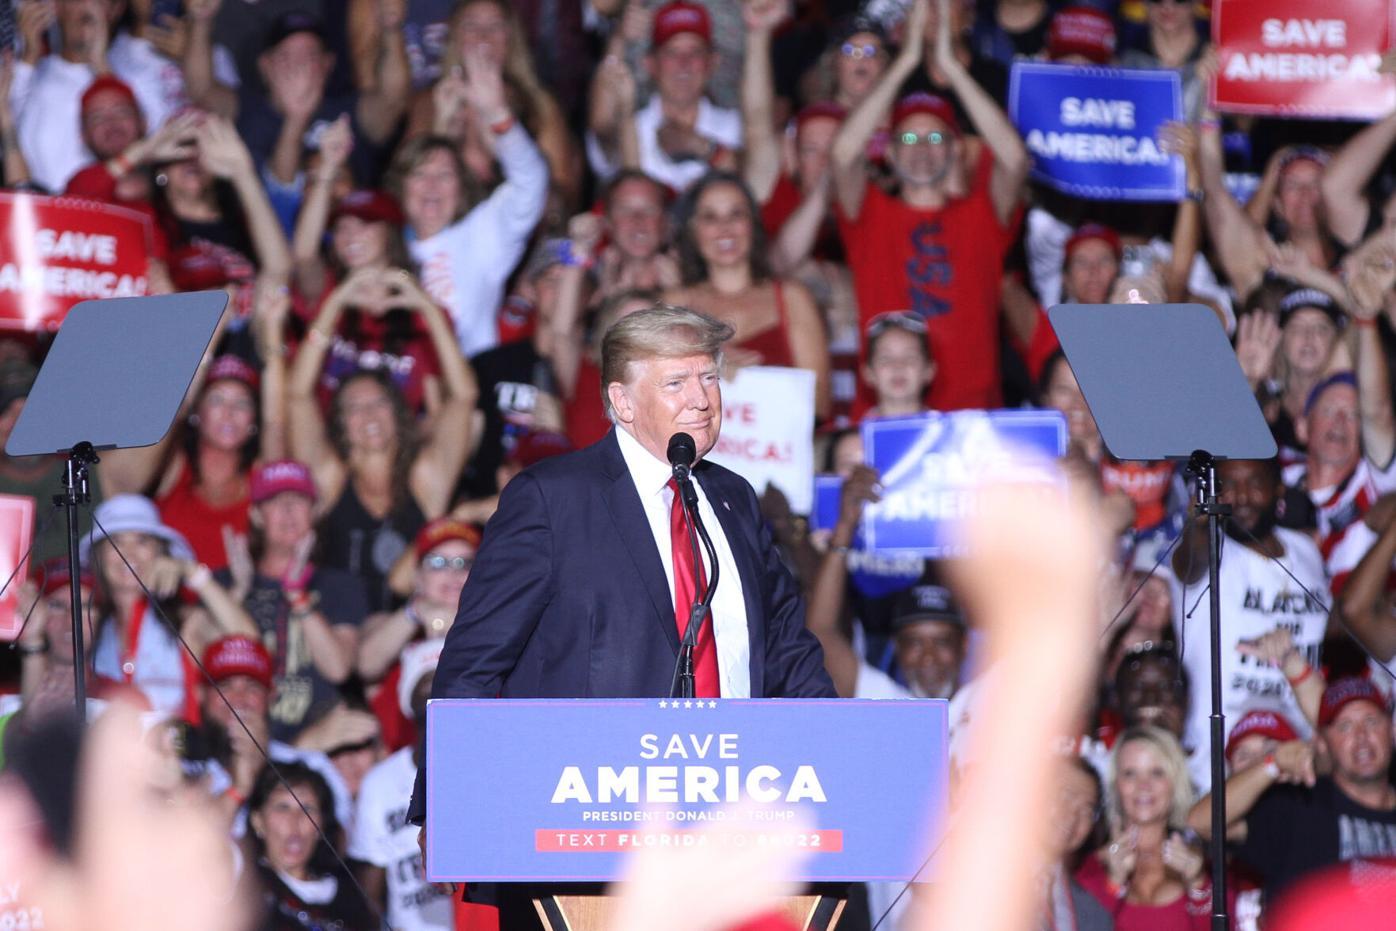 Donald Trump in Sarasota on July 3, 2021